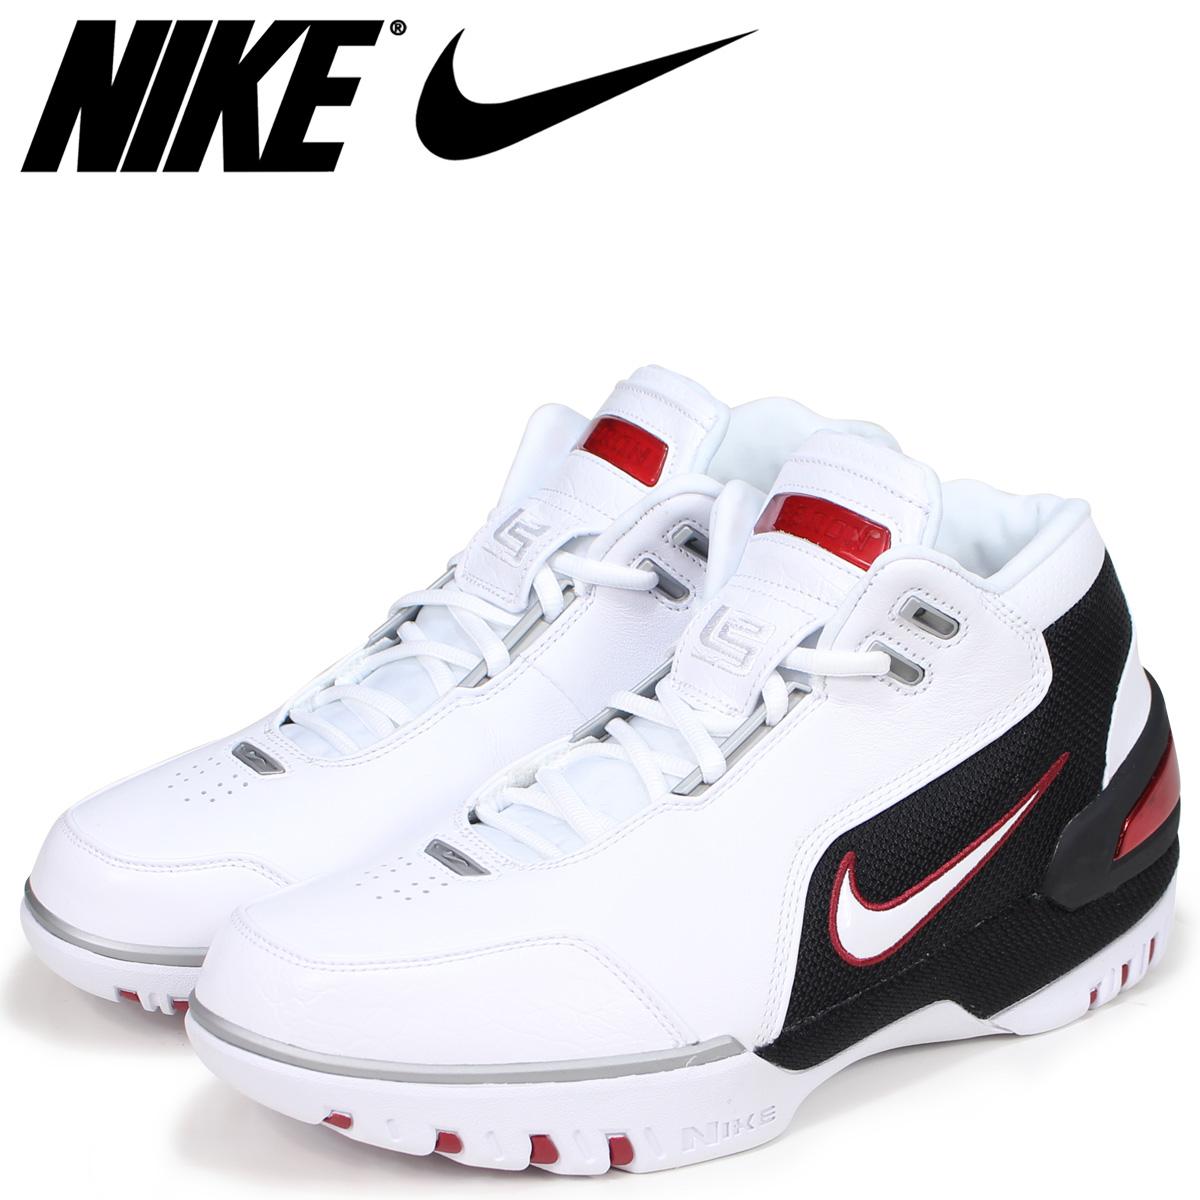 4641a605cf2 Sugar Online Shop  NIKE Nike air zoom generation sneakers men AIR ...